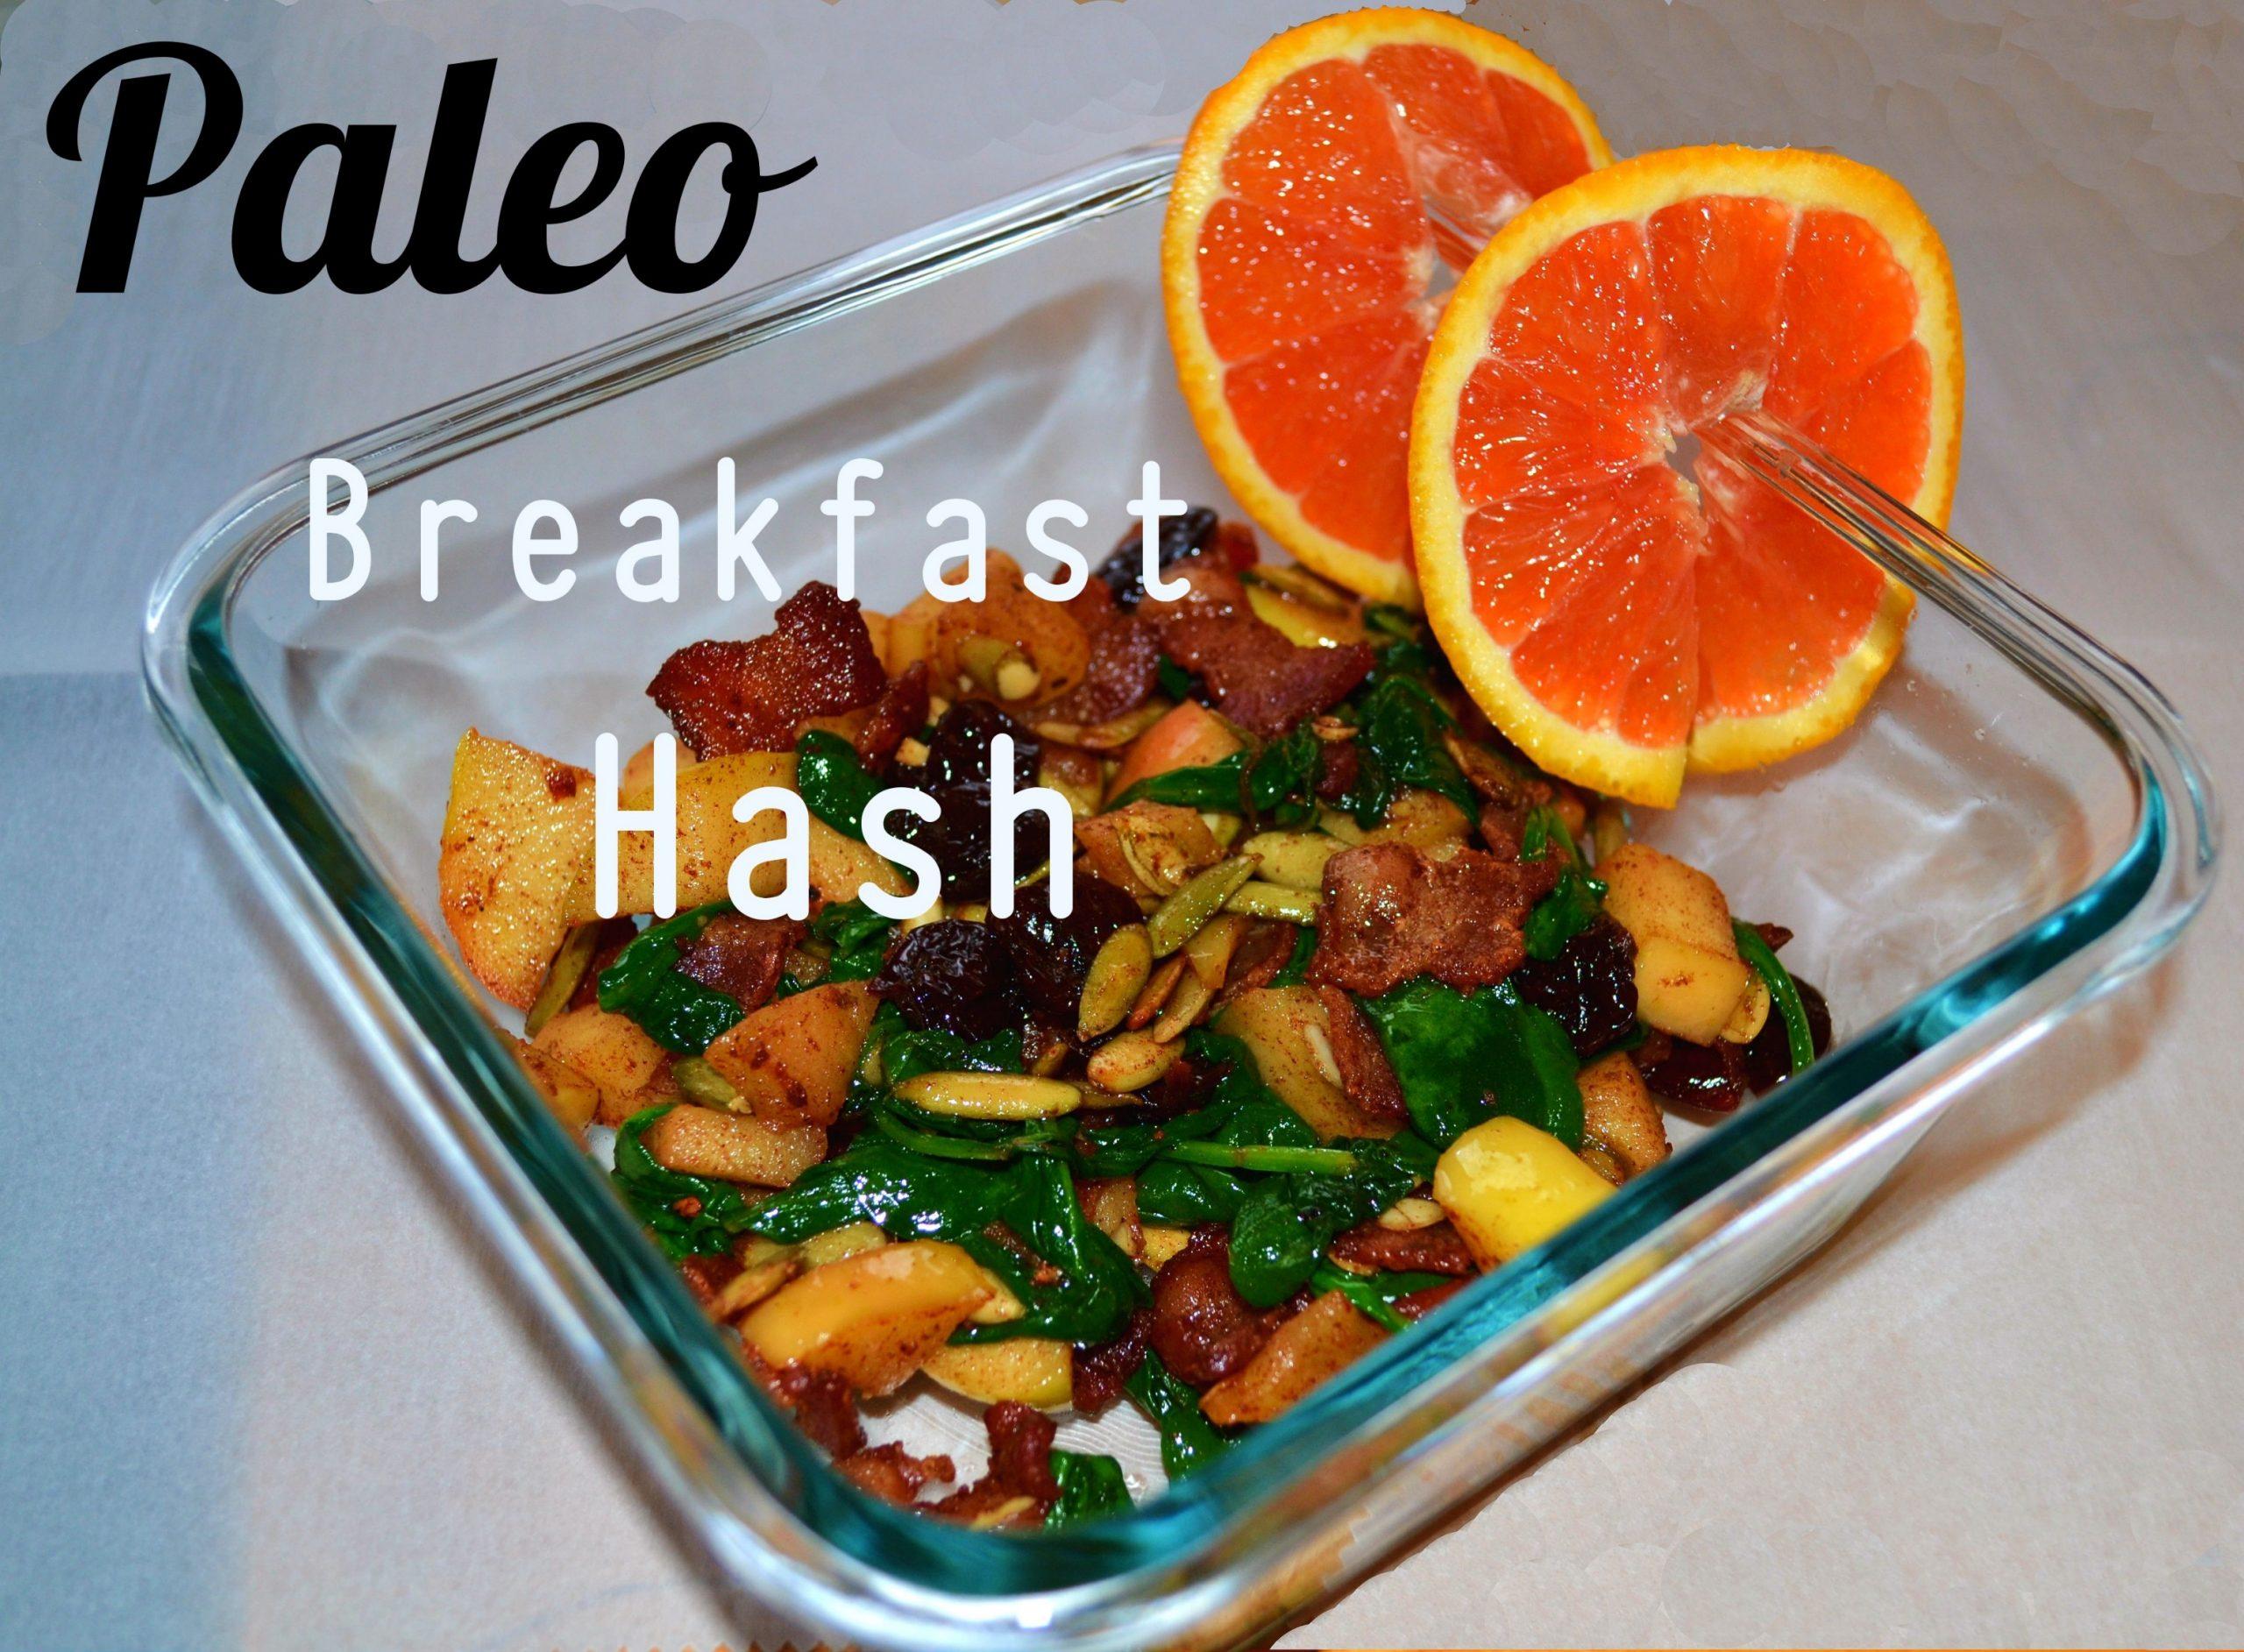 Paleo Breakfast Hash | The Hormone Diva